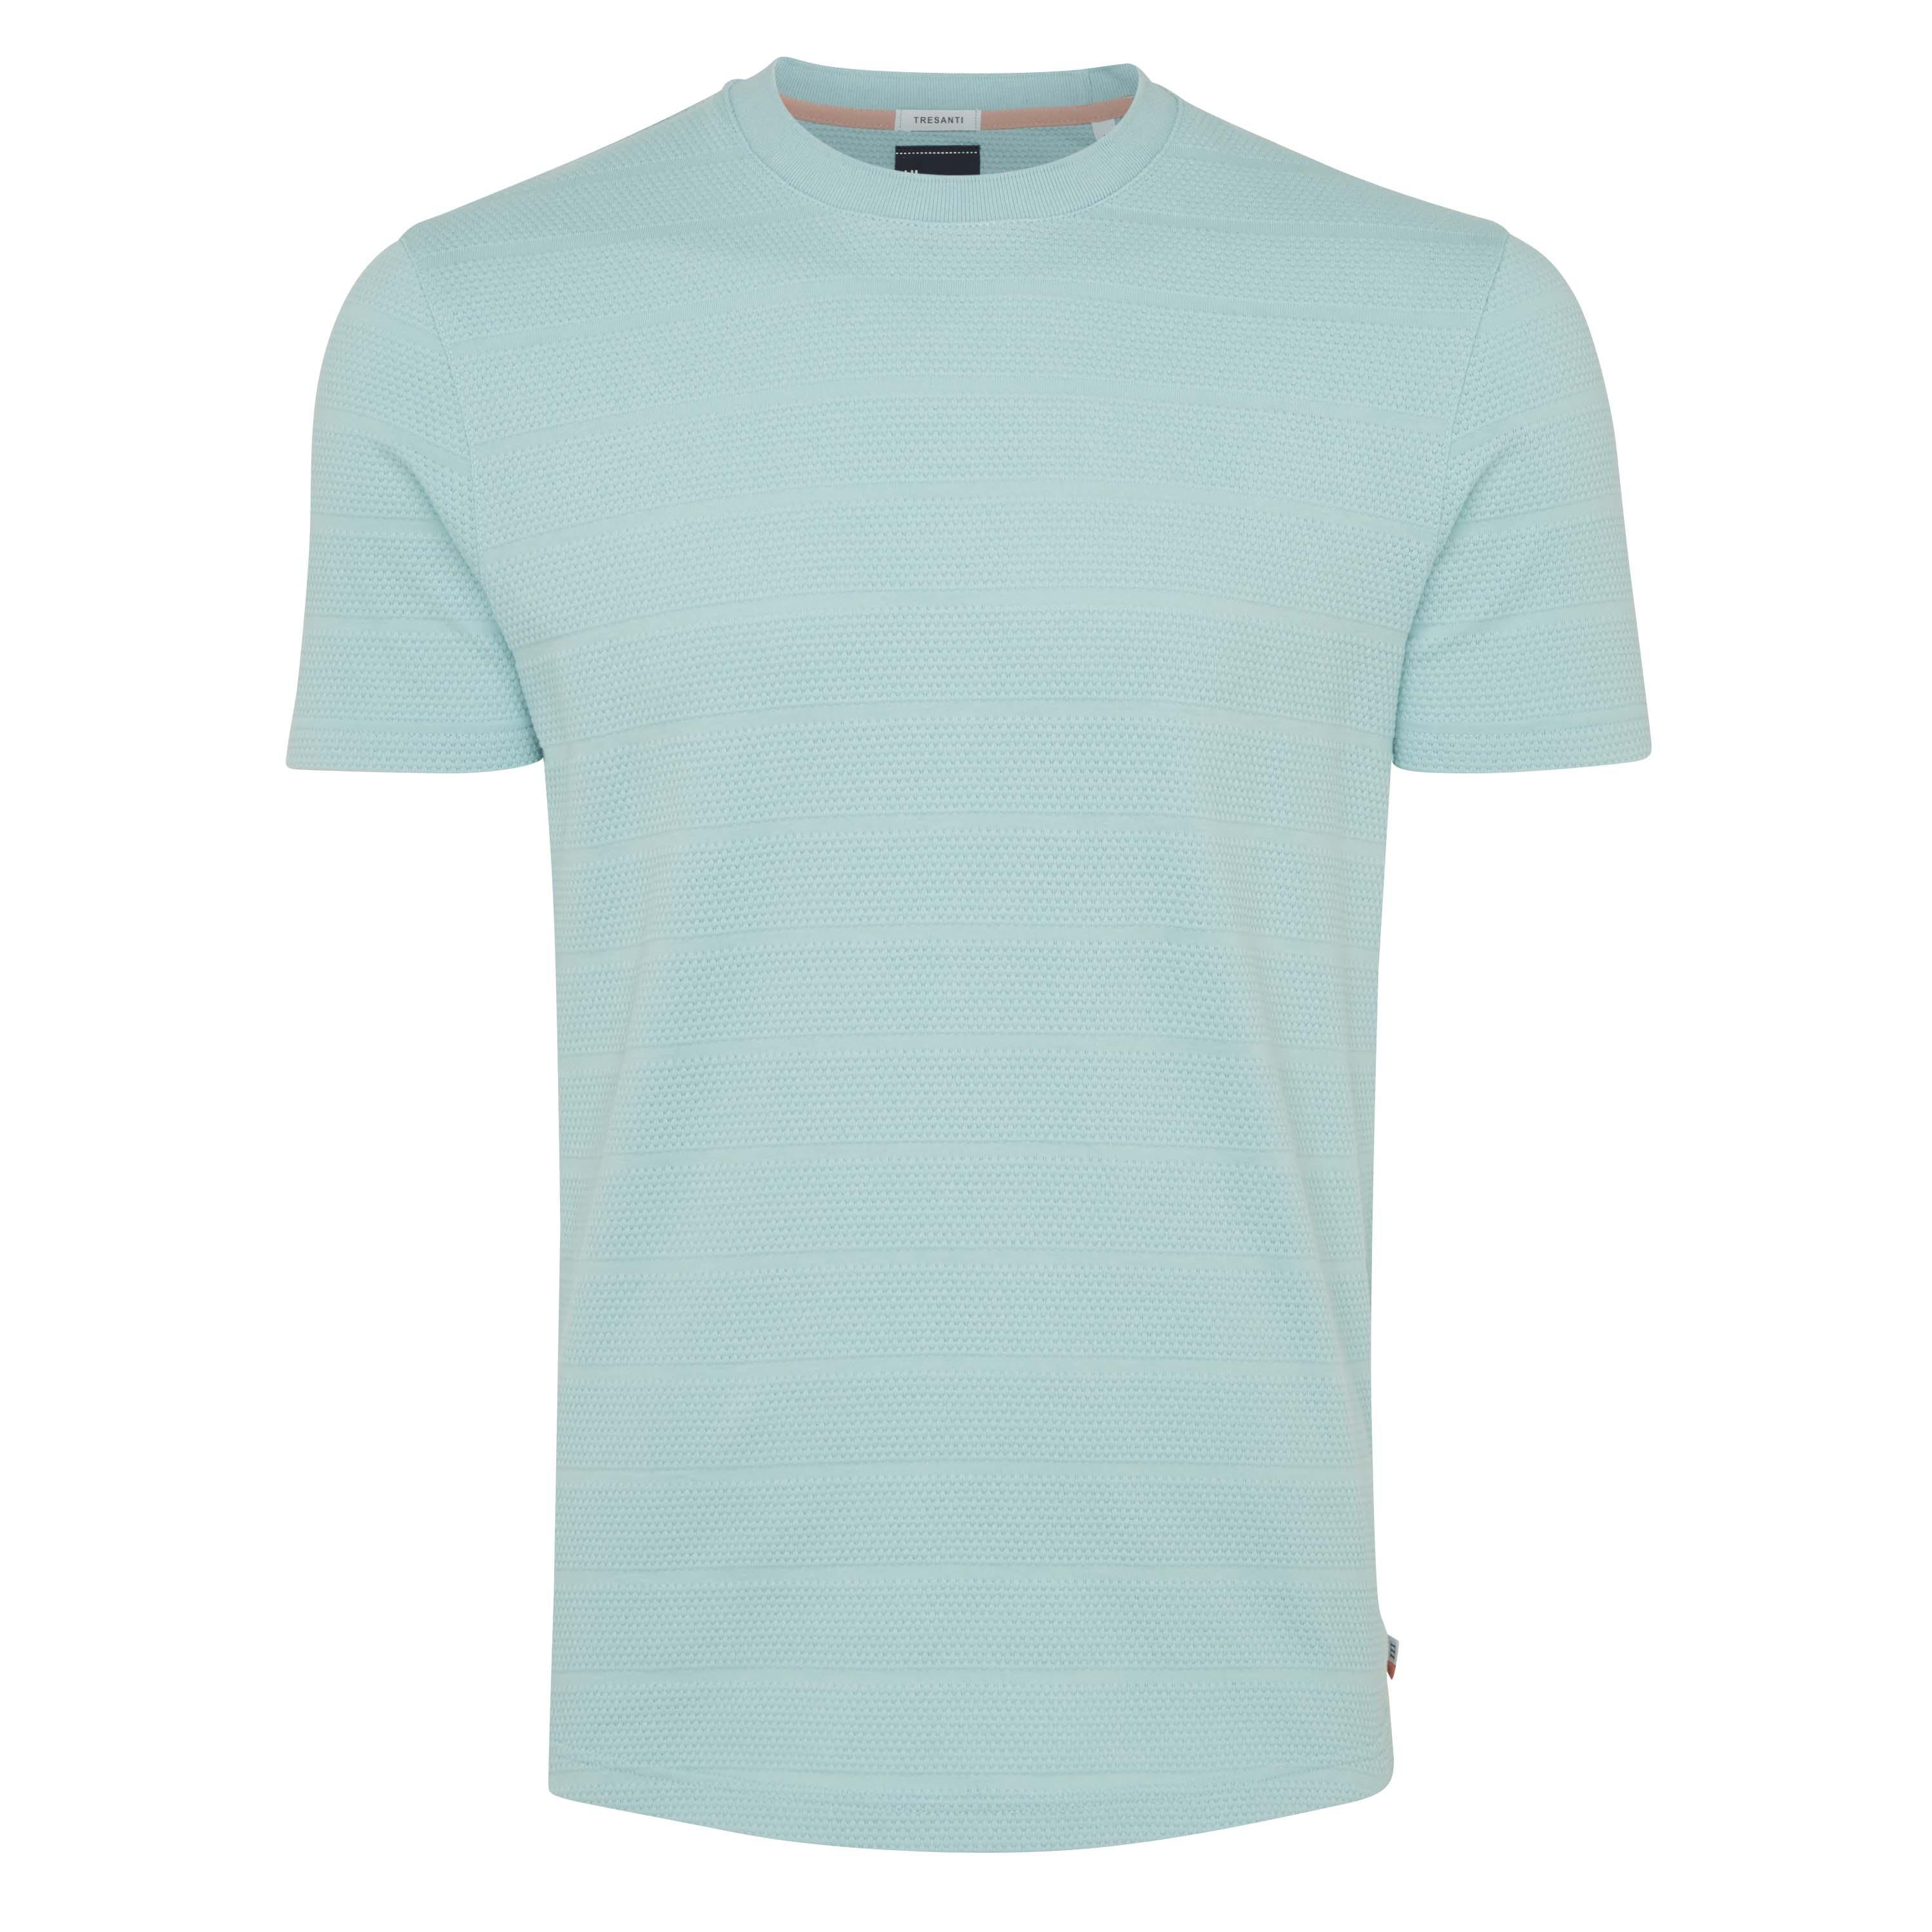 Tony | T-shirt structure mint green